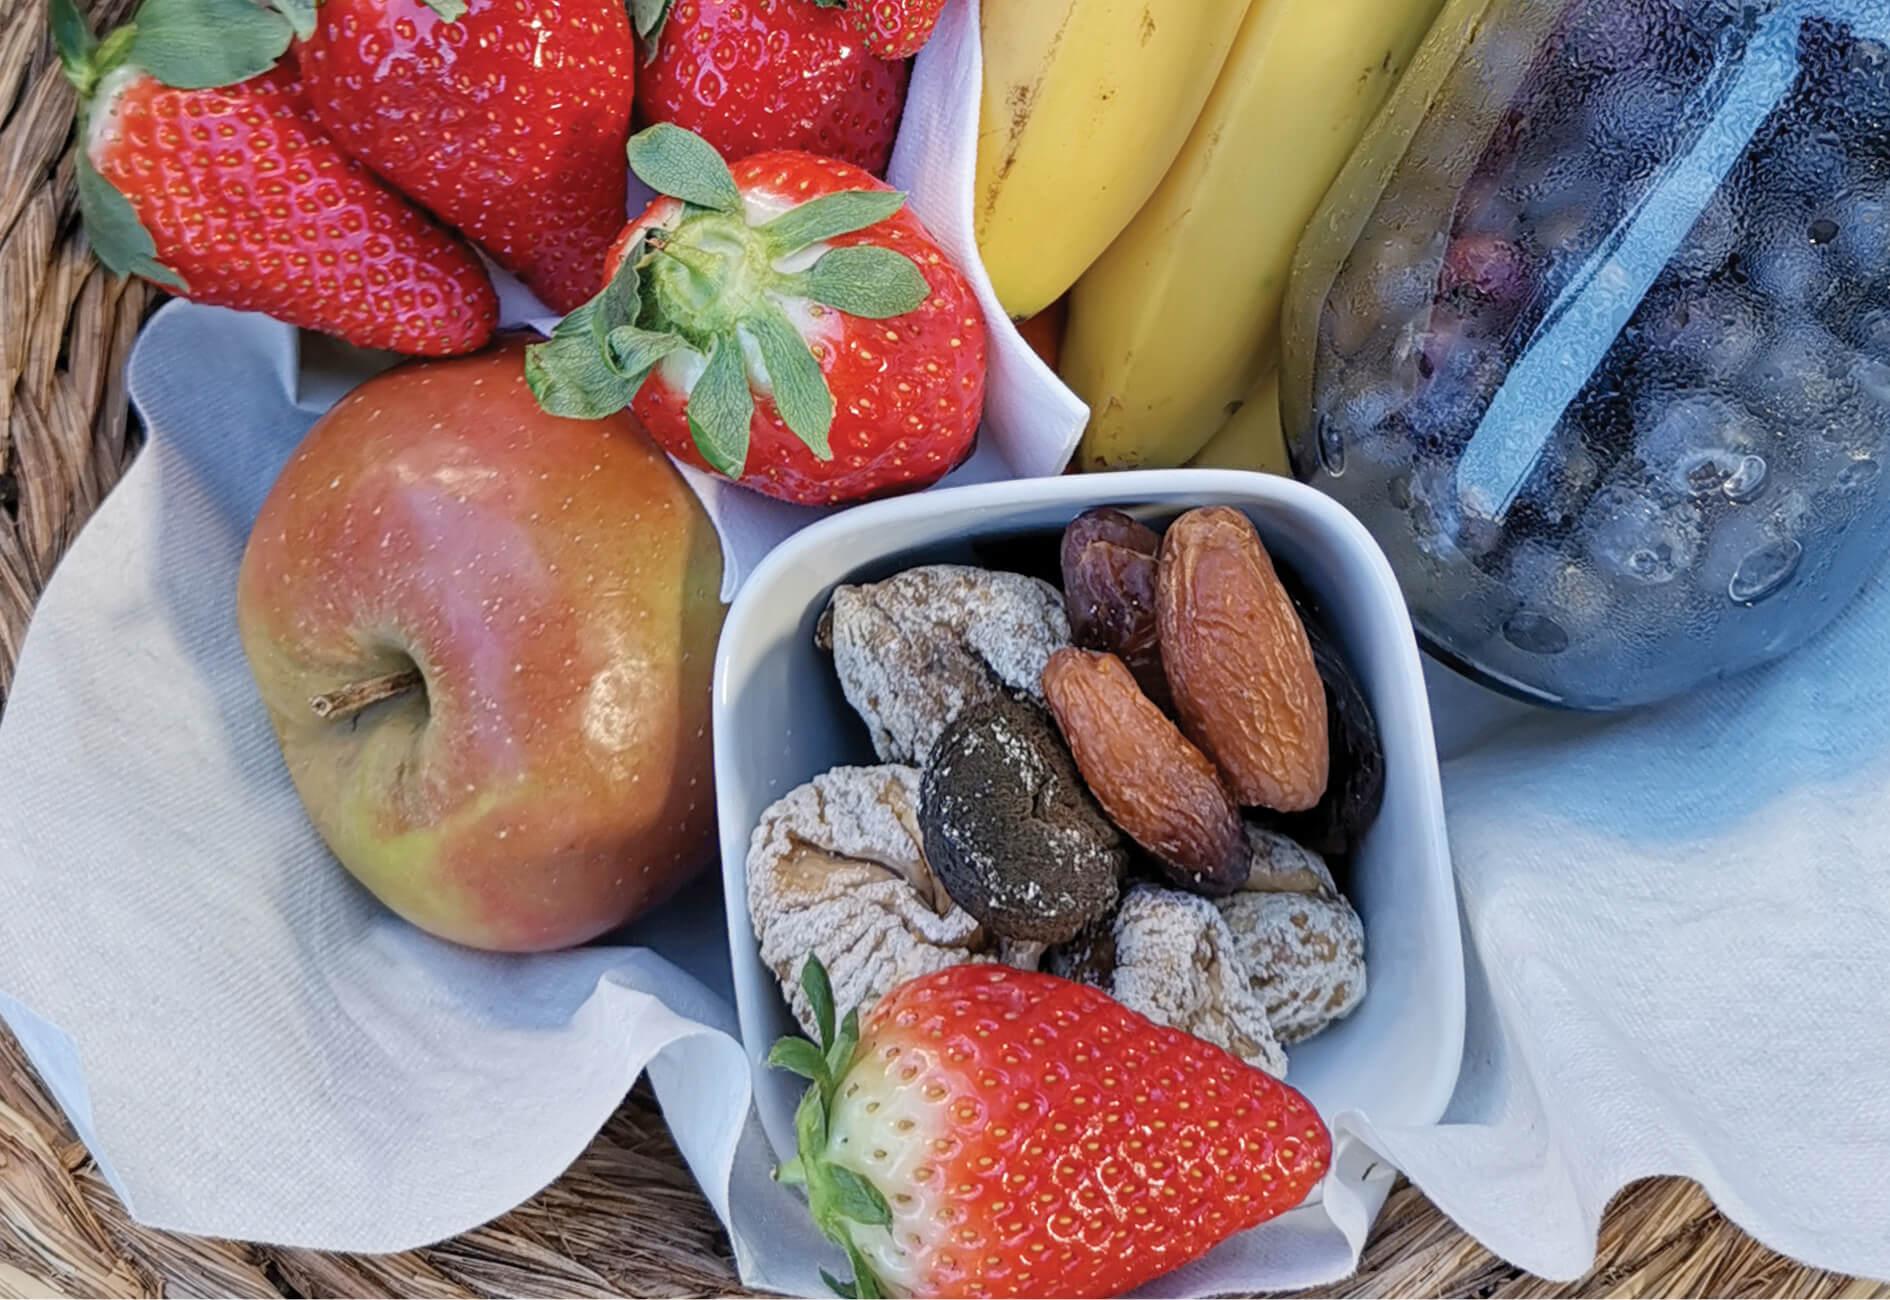 Nahrungsergänzungsmittel: Machen Vitamintabletten Sinn?